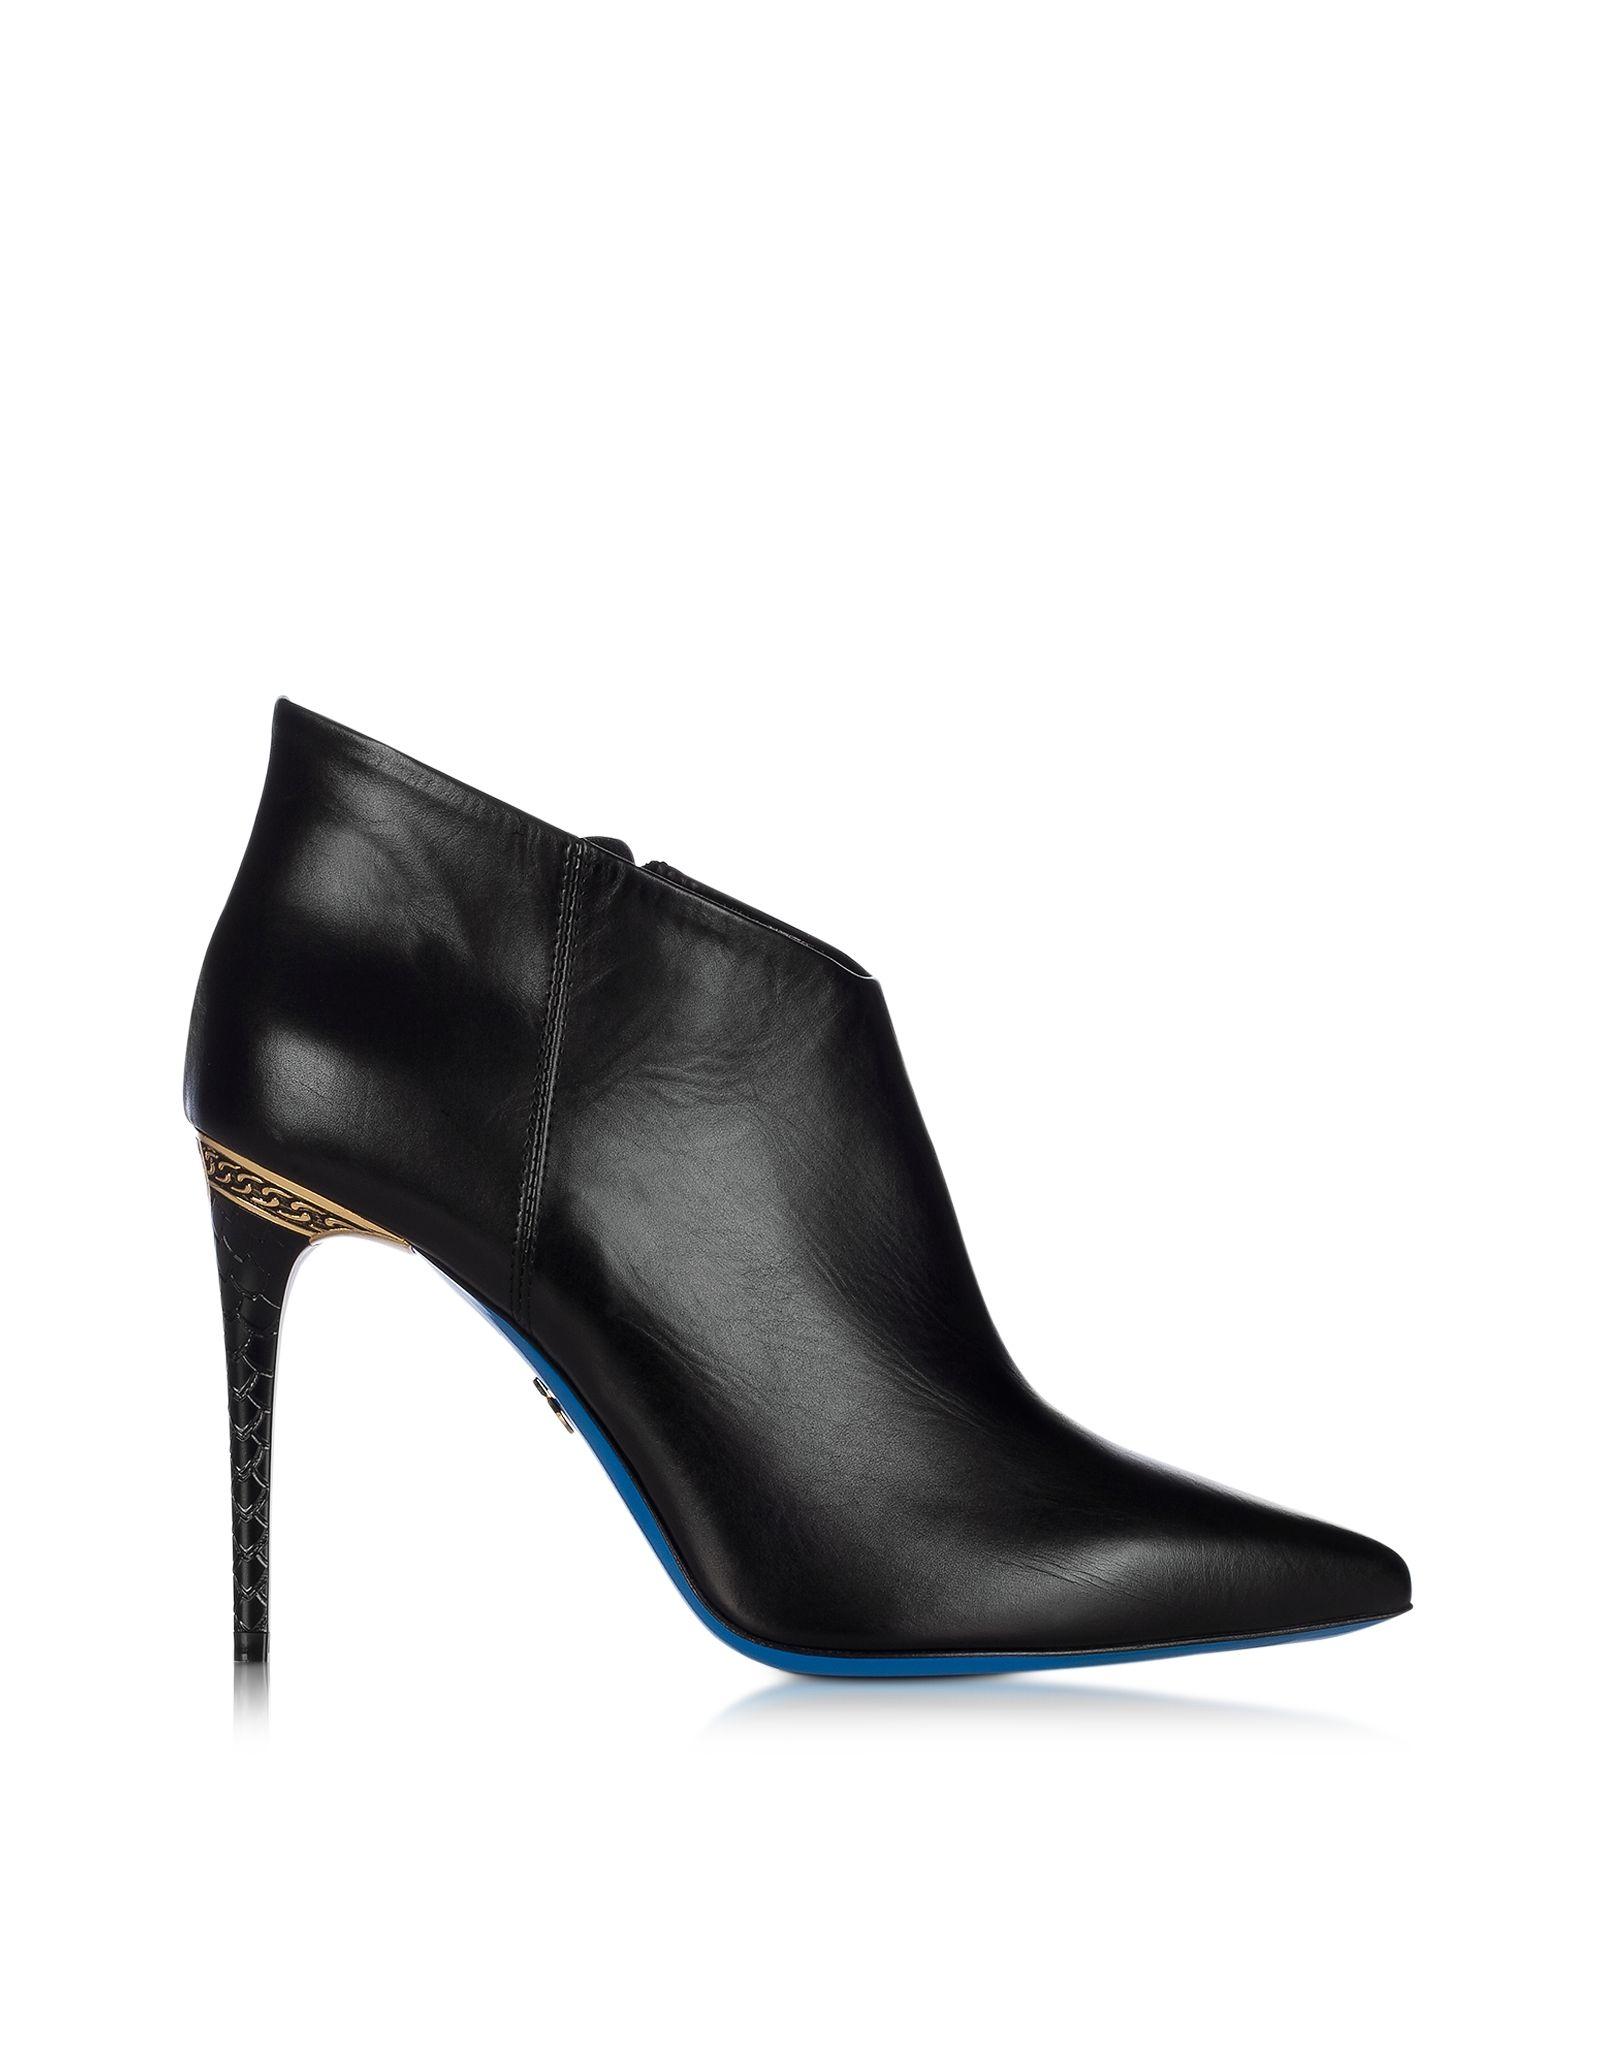 LORIBLU Designer Shoes, Patent Leather Pointed Pump